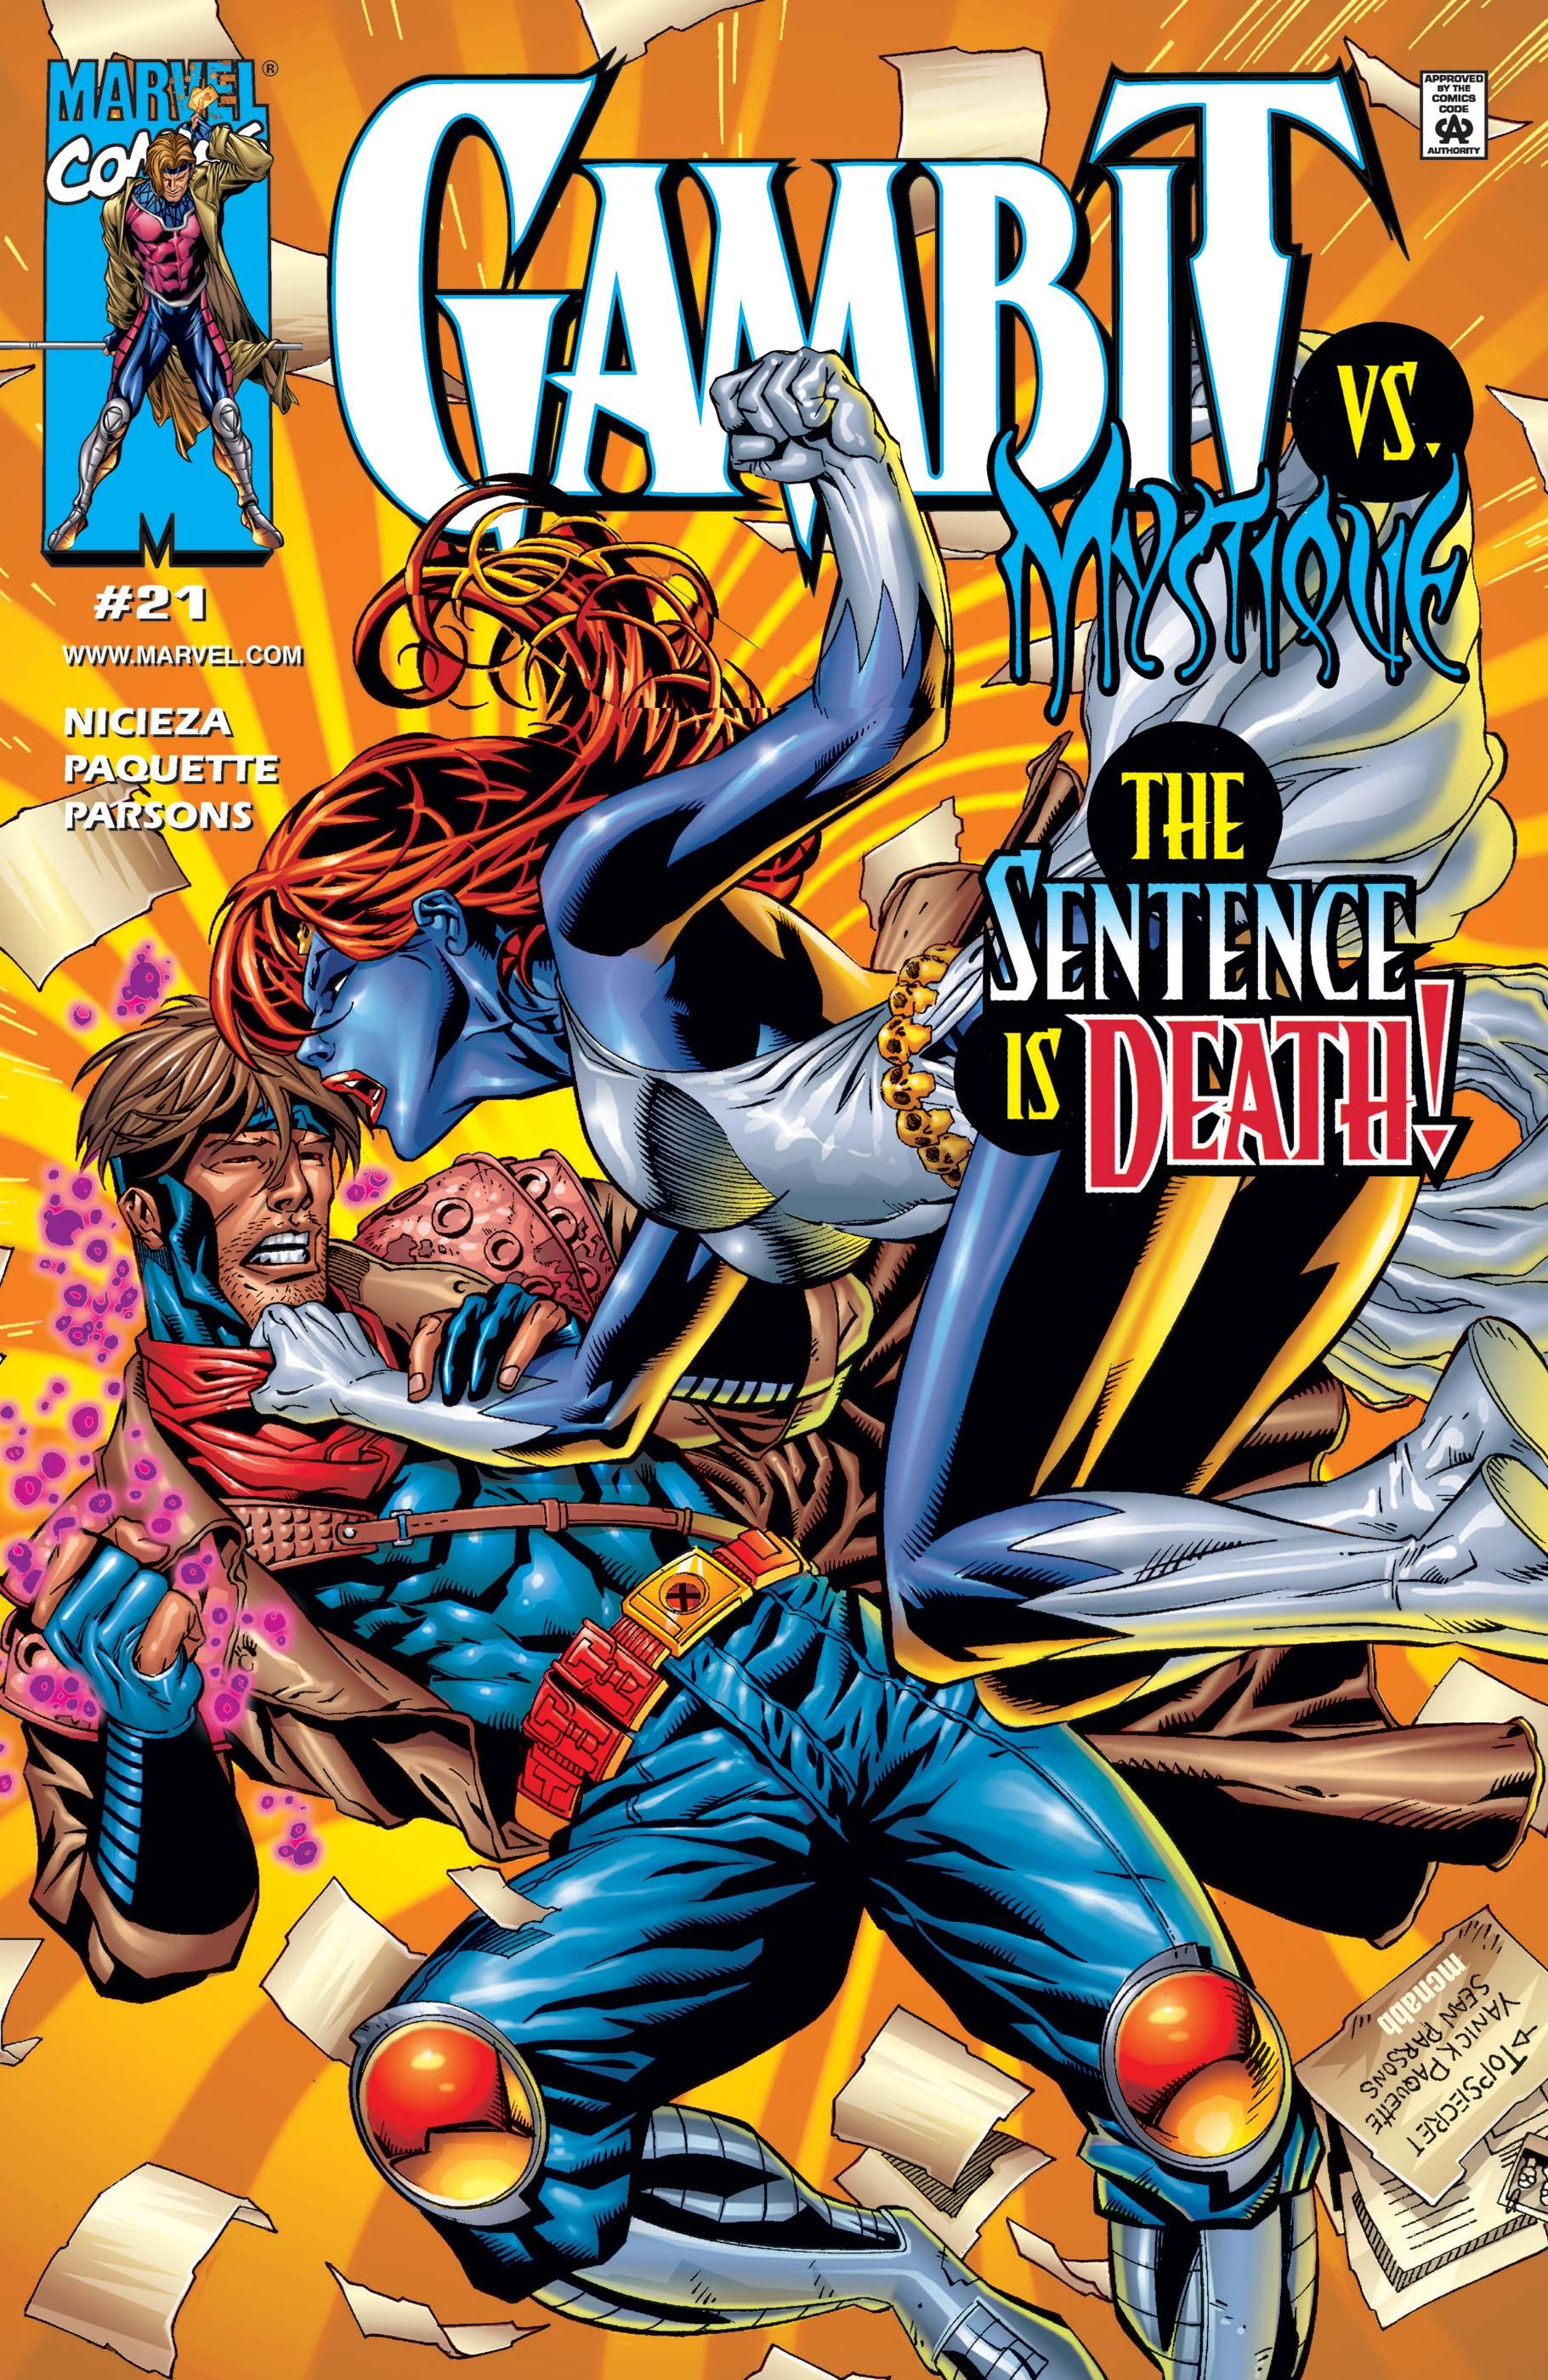 Gambit (1999) #21